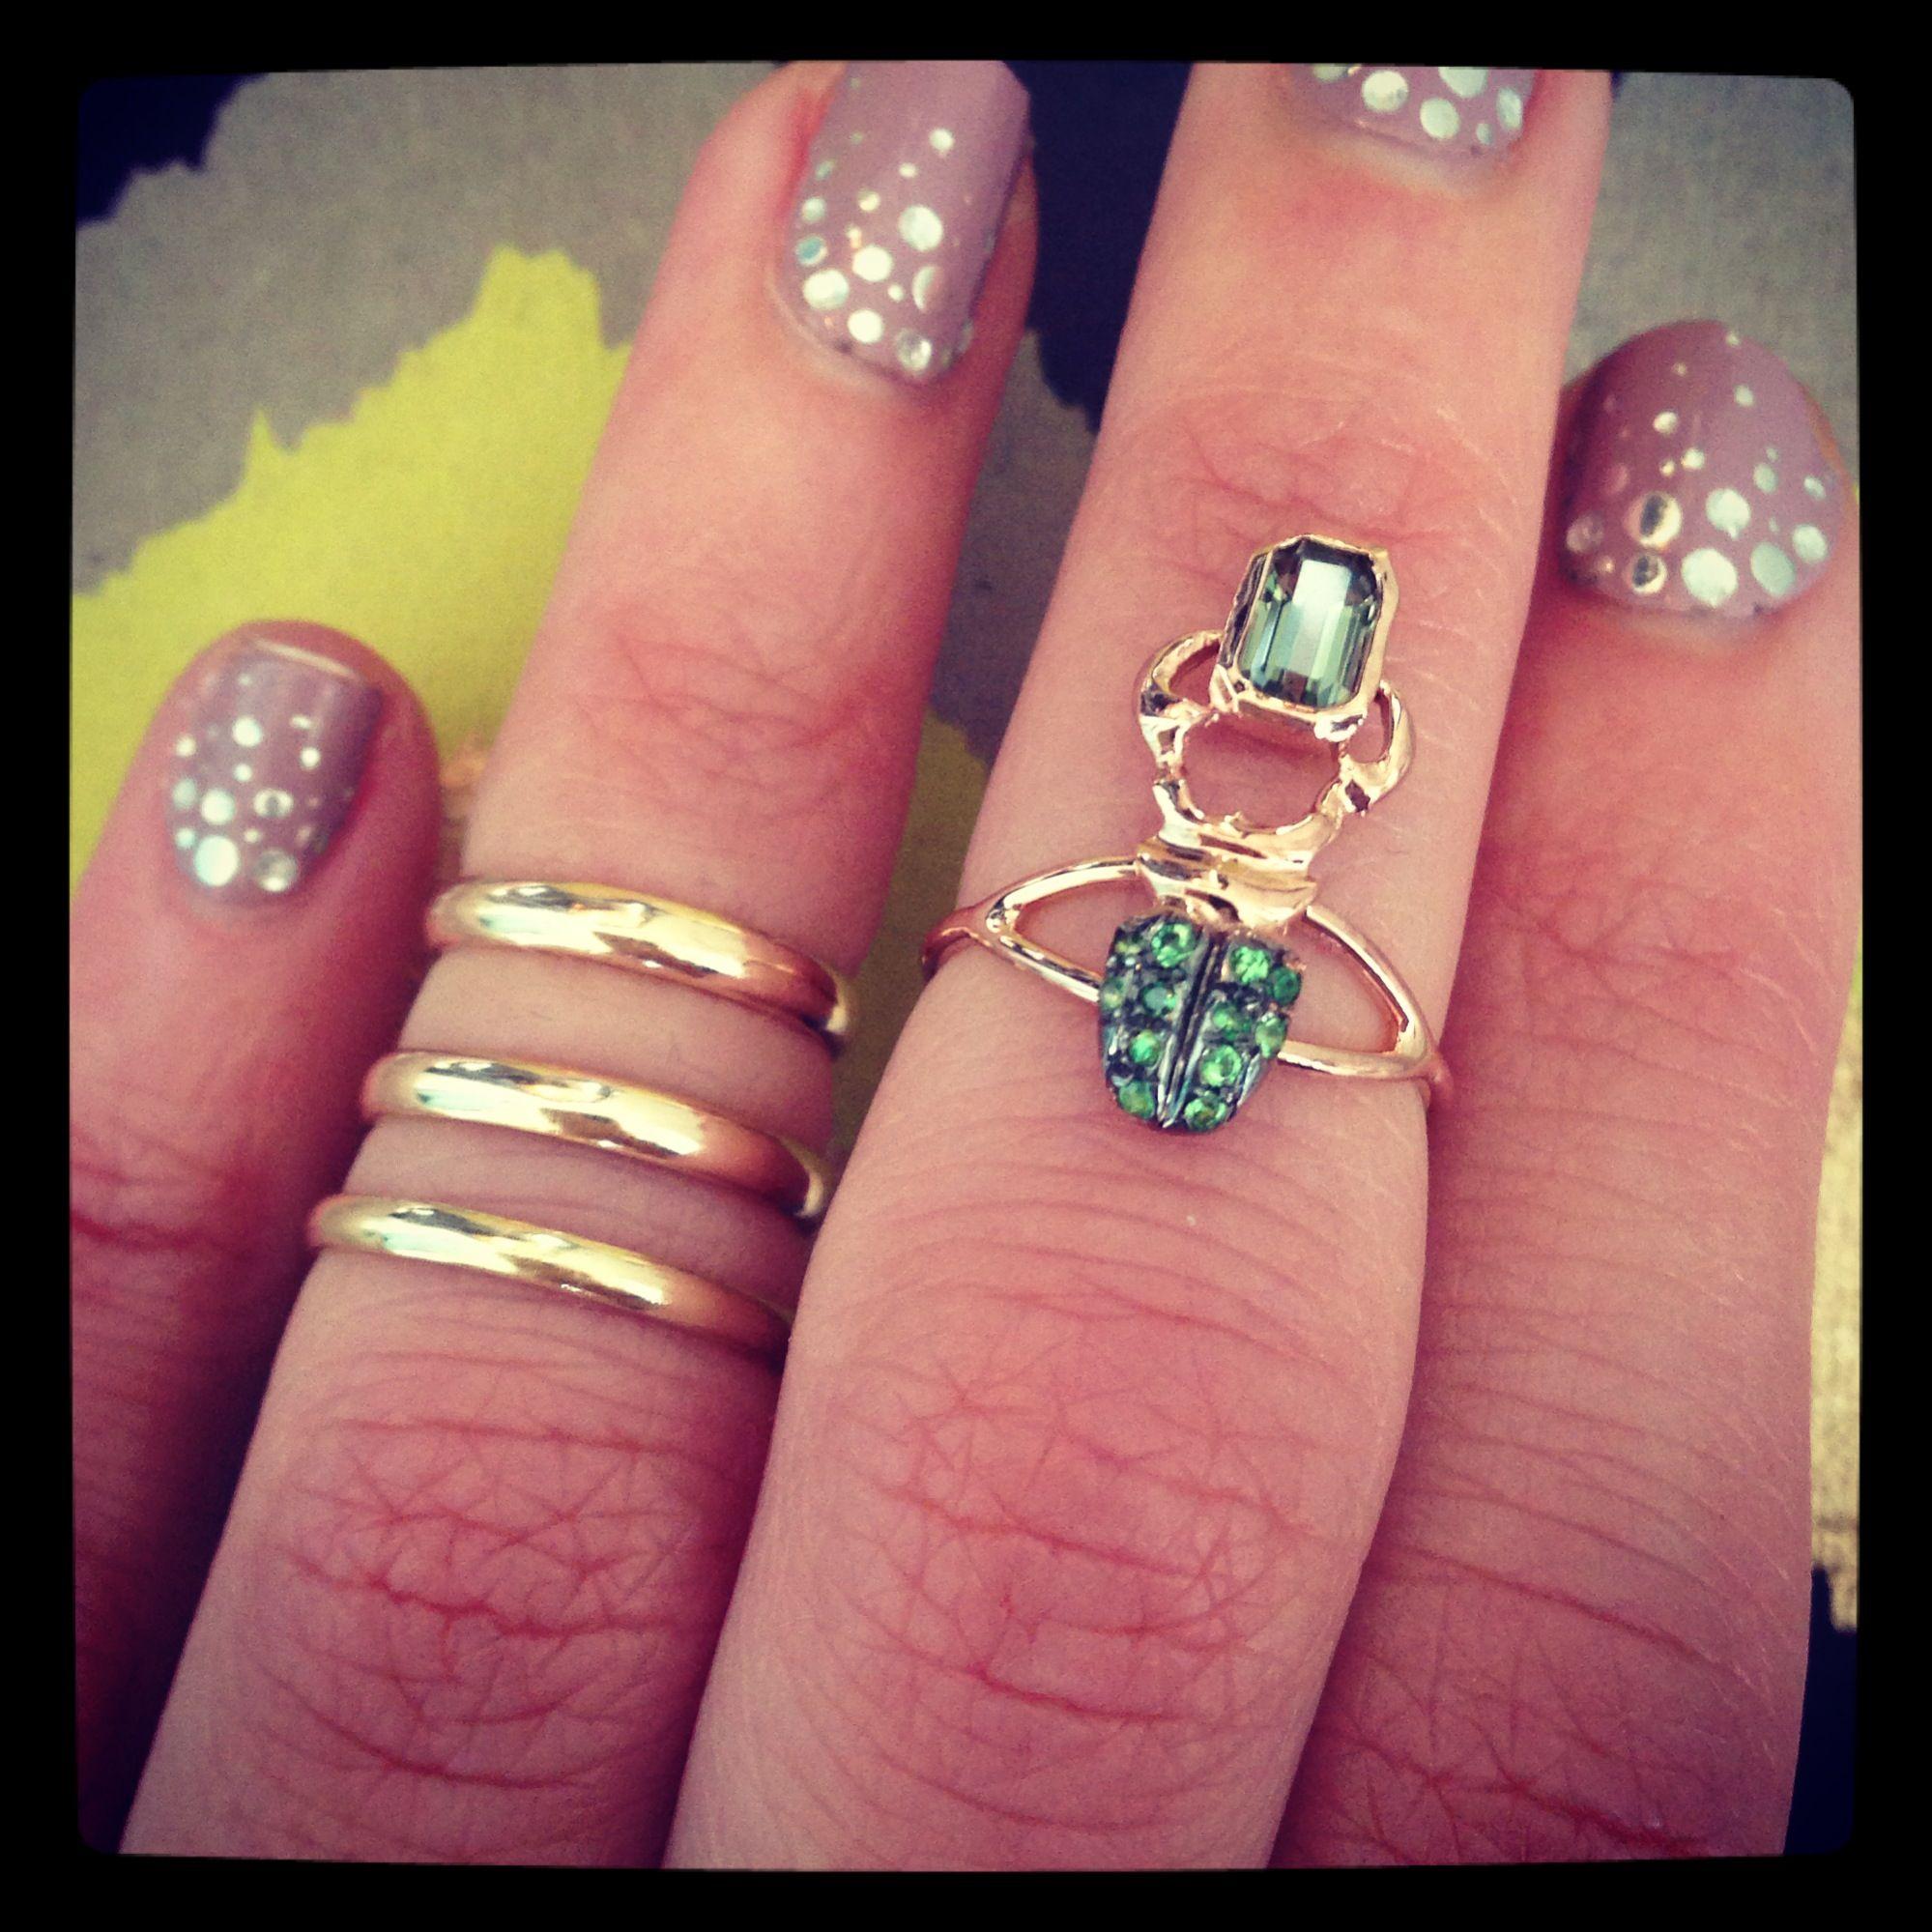 Daniela Villegas jewelry | DESIGNER JEWELRY | Pinterest | Ring ...